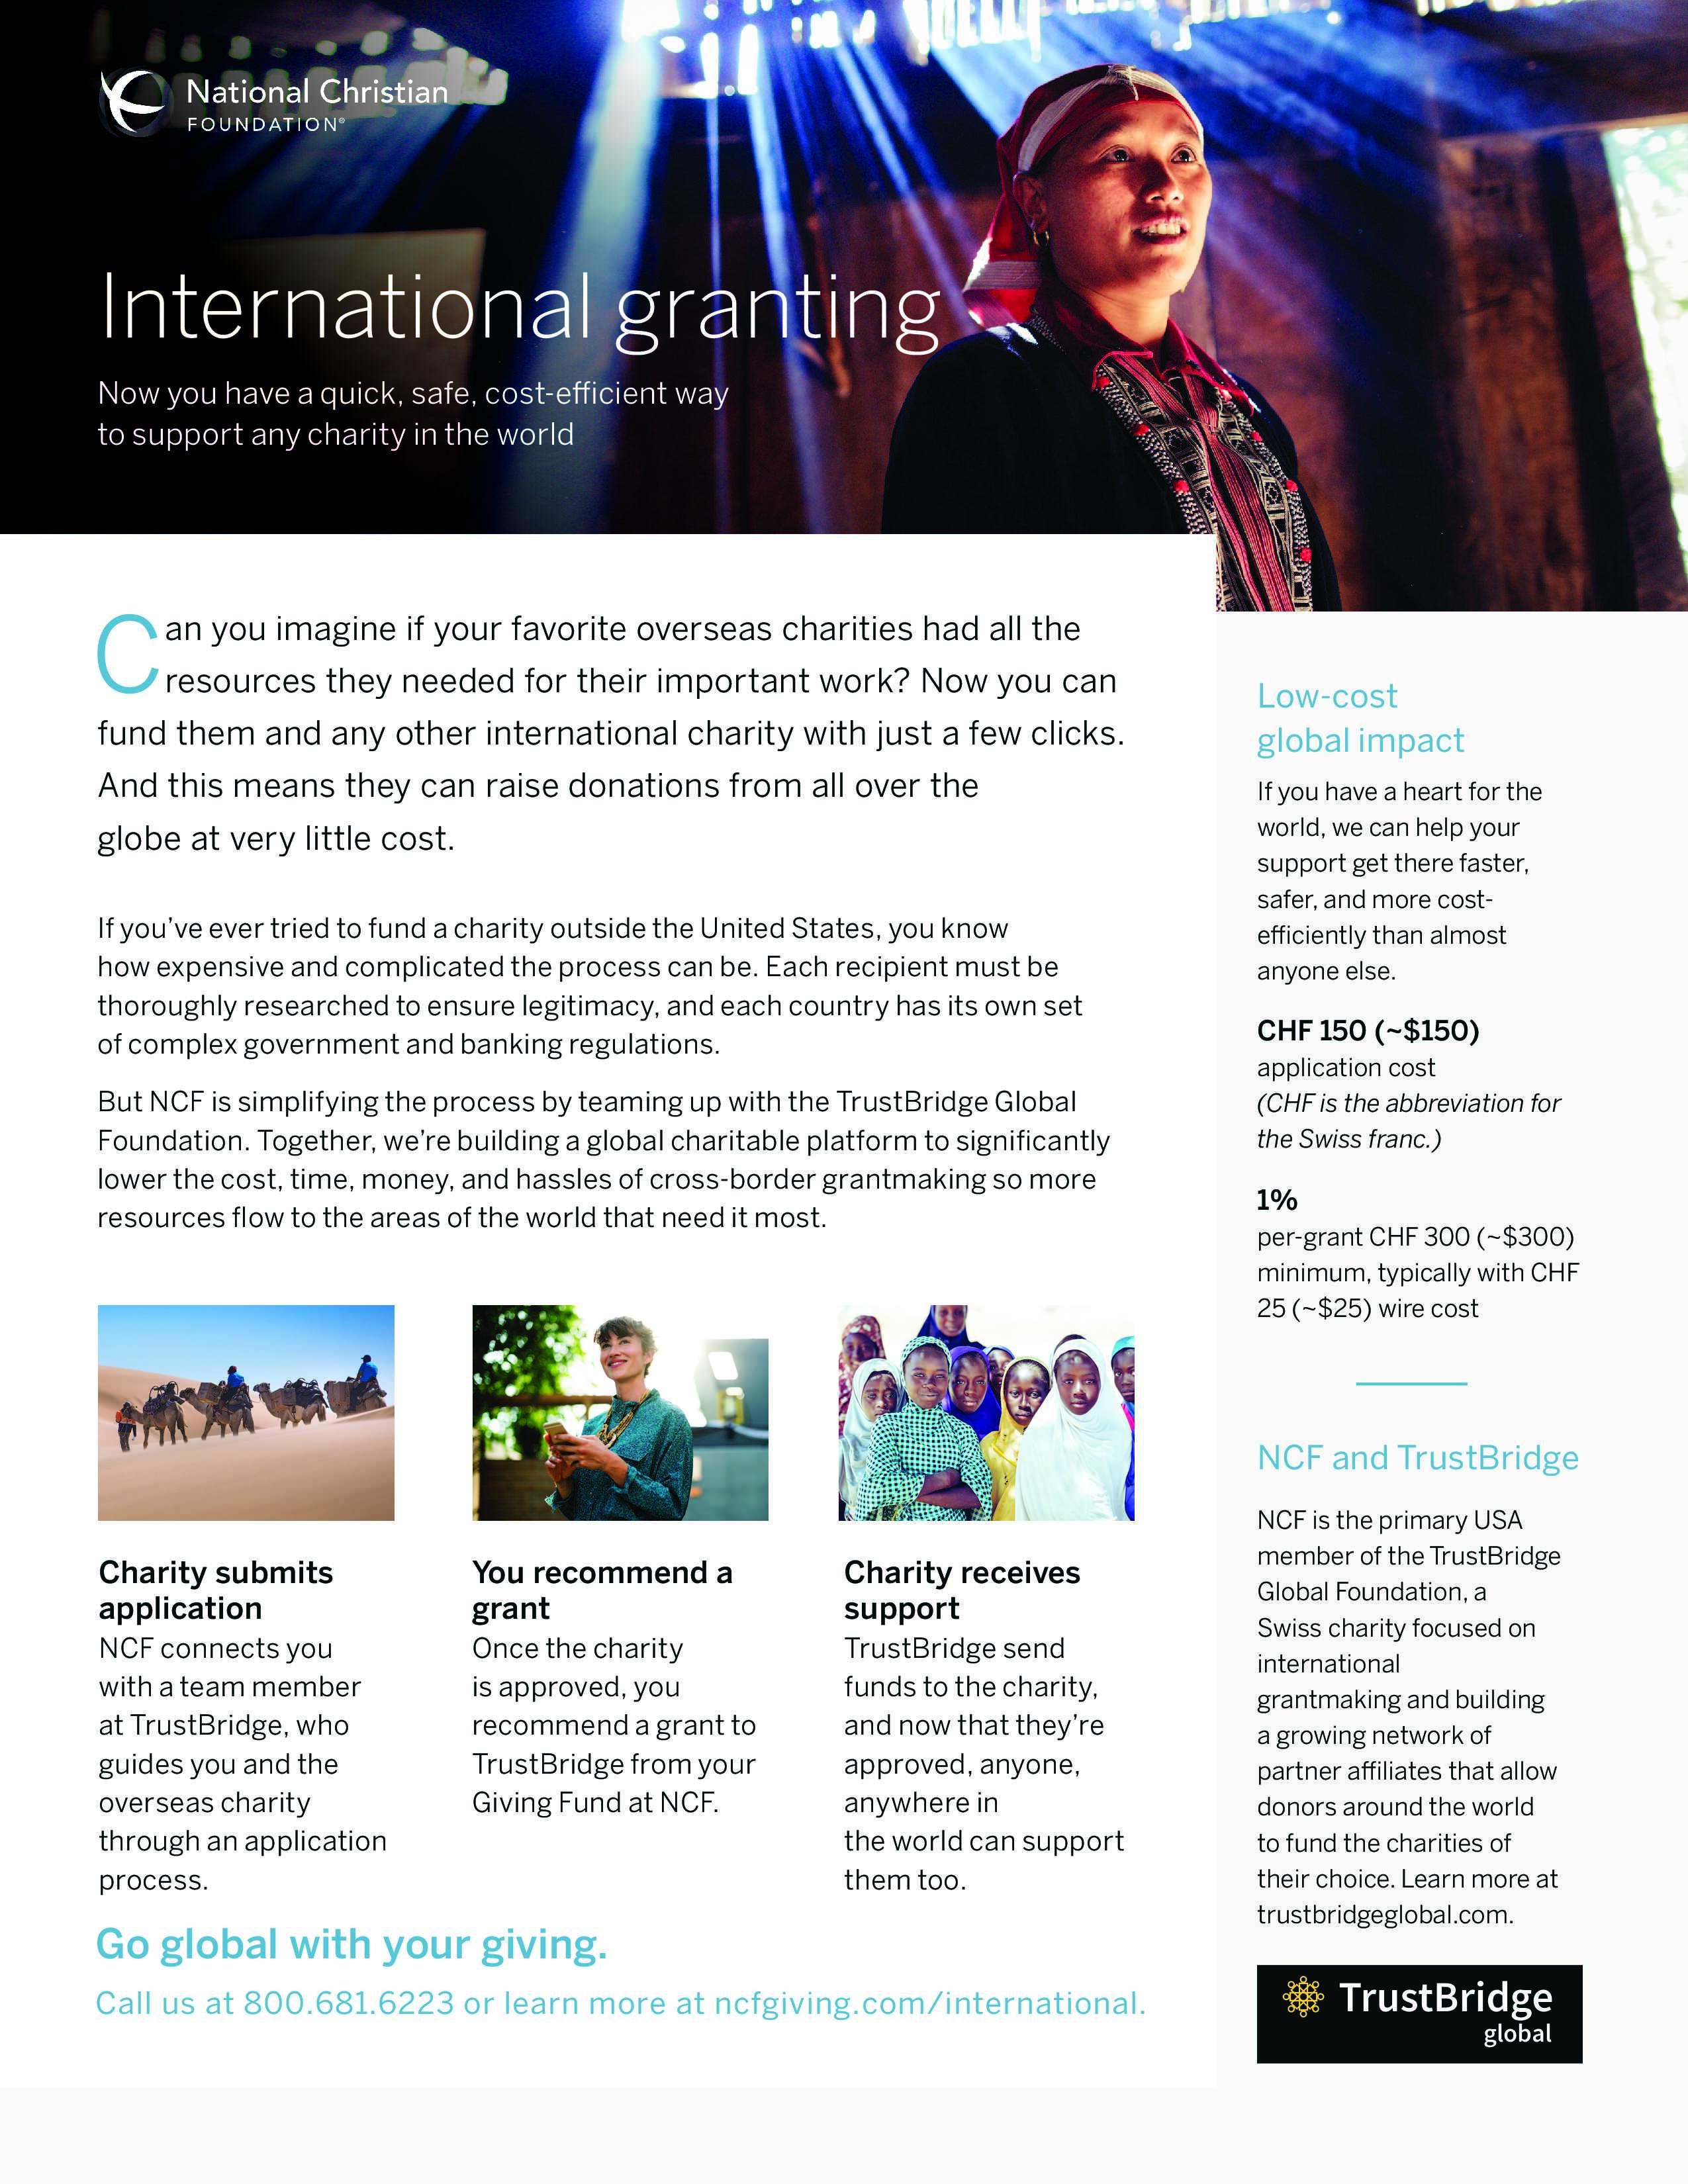 International Granting